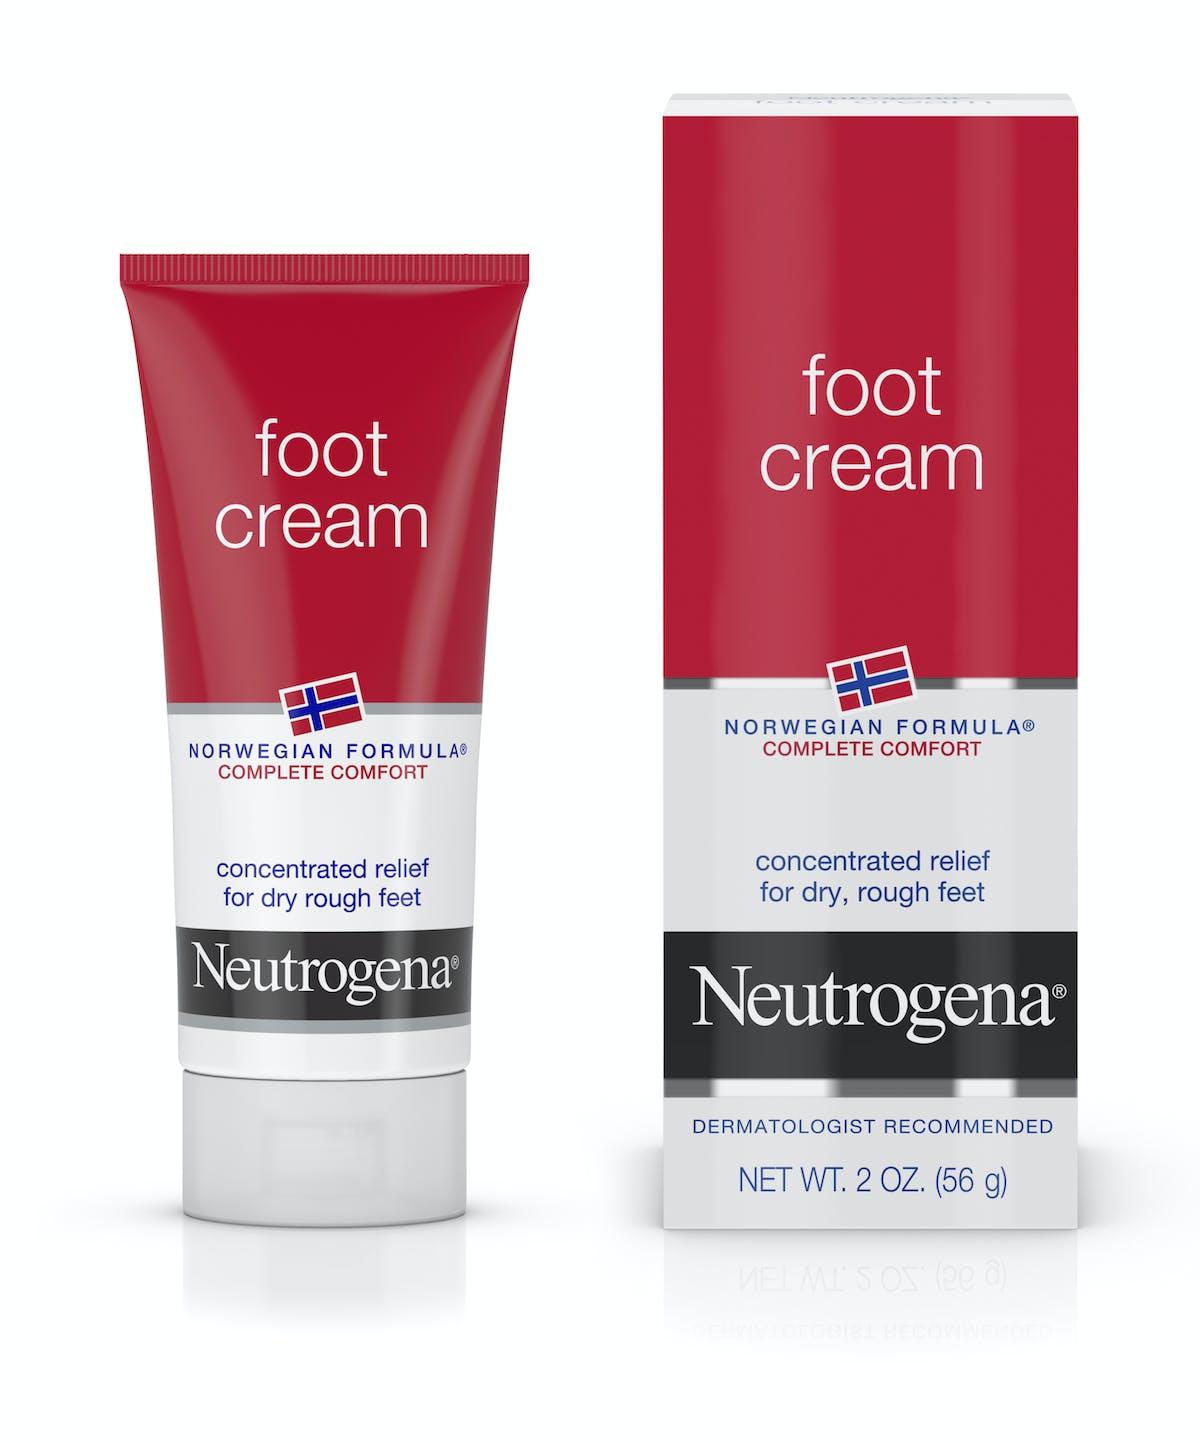 Norwegian Formula® Foot Cream